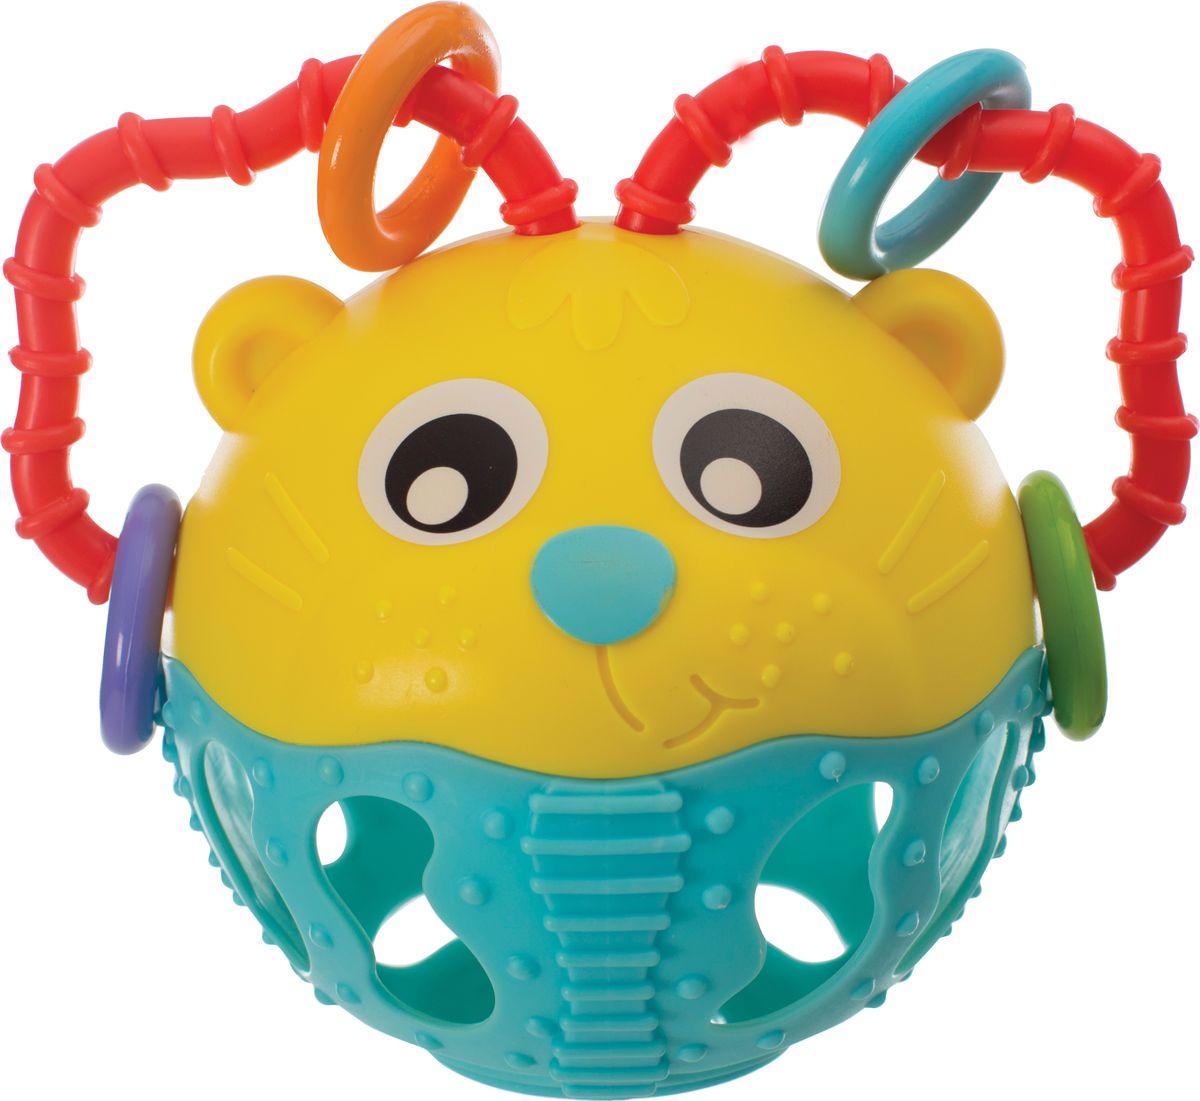 Playgro Погремушка Шар 4085488 playgro погремушка шар